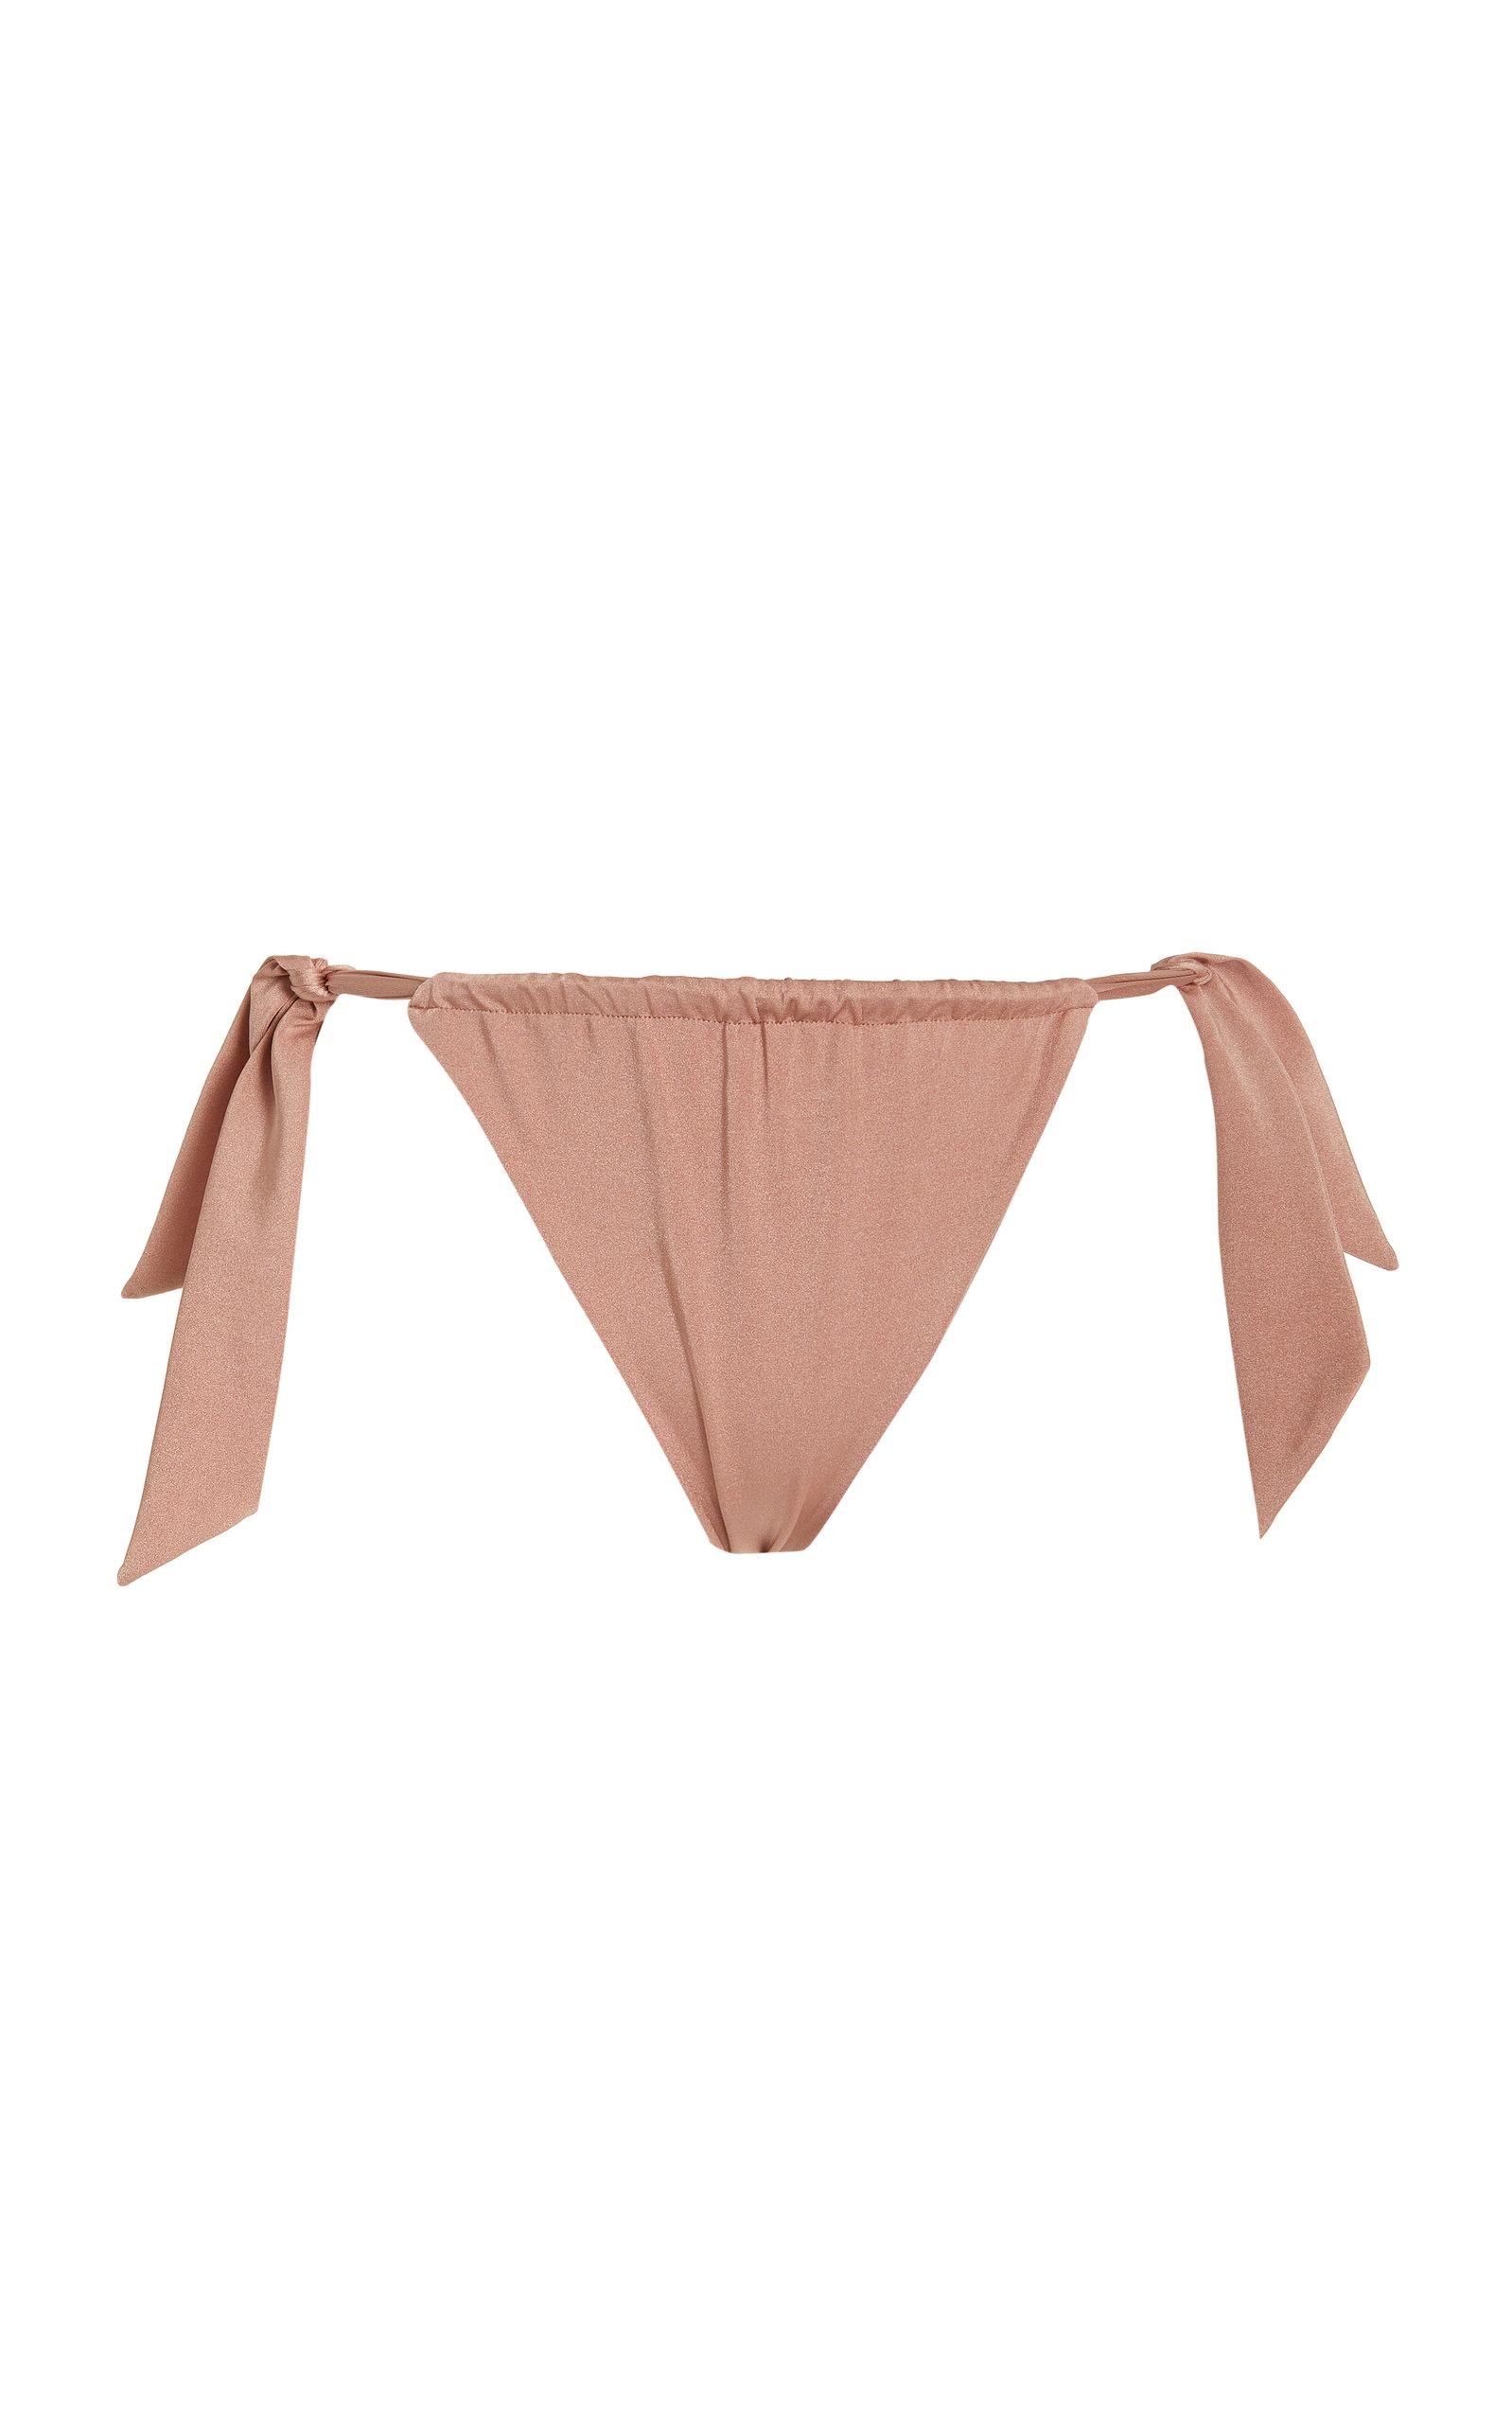 Women's Mantra Tie-Detailed Bikini Bottom